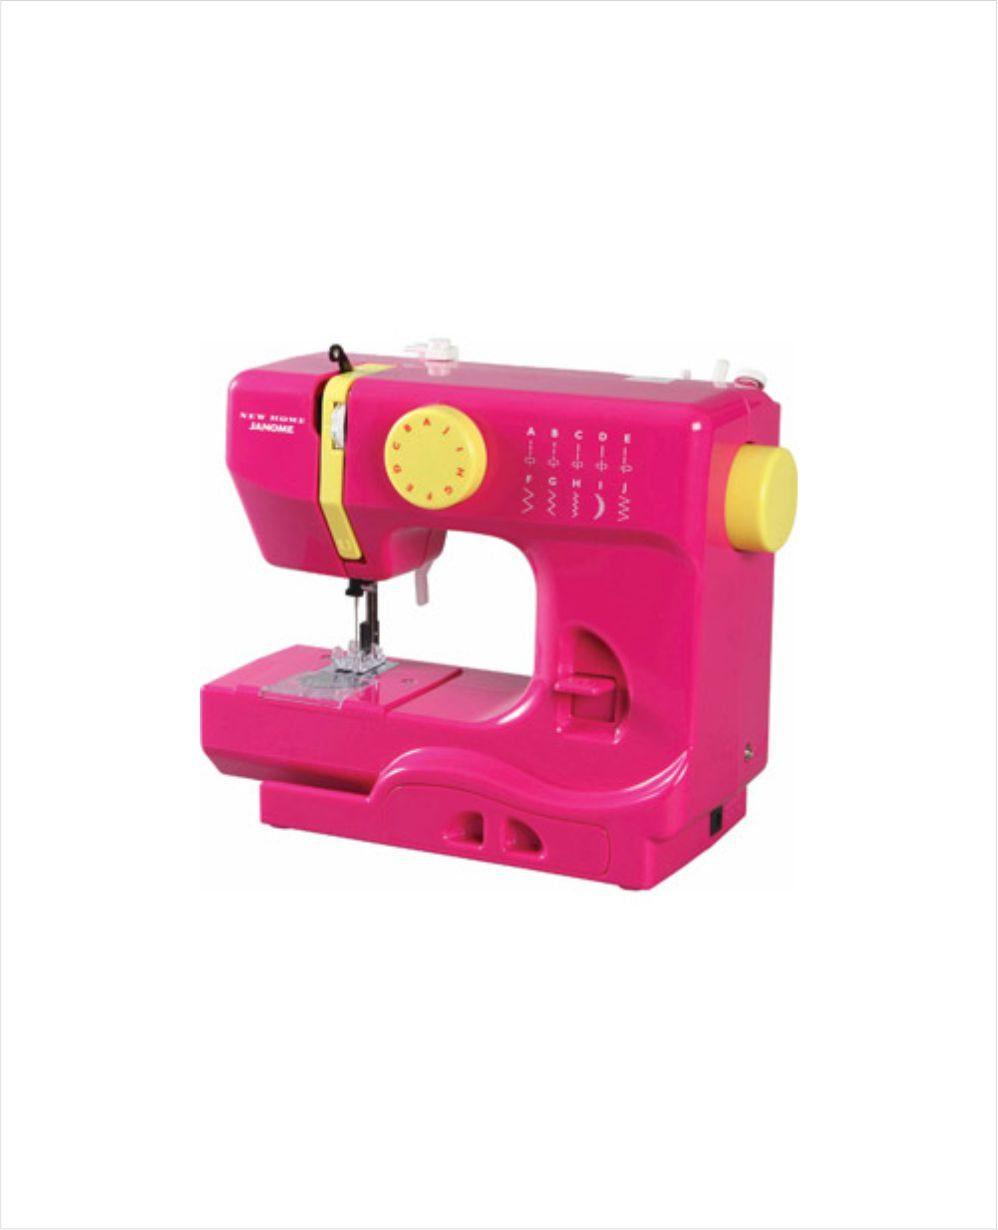 janome fastlane sewing machine